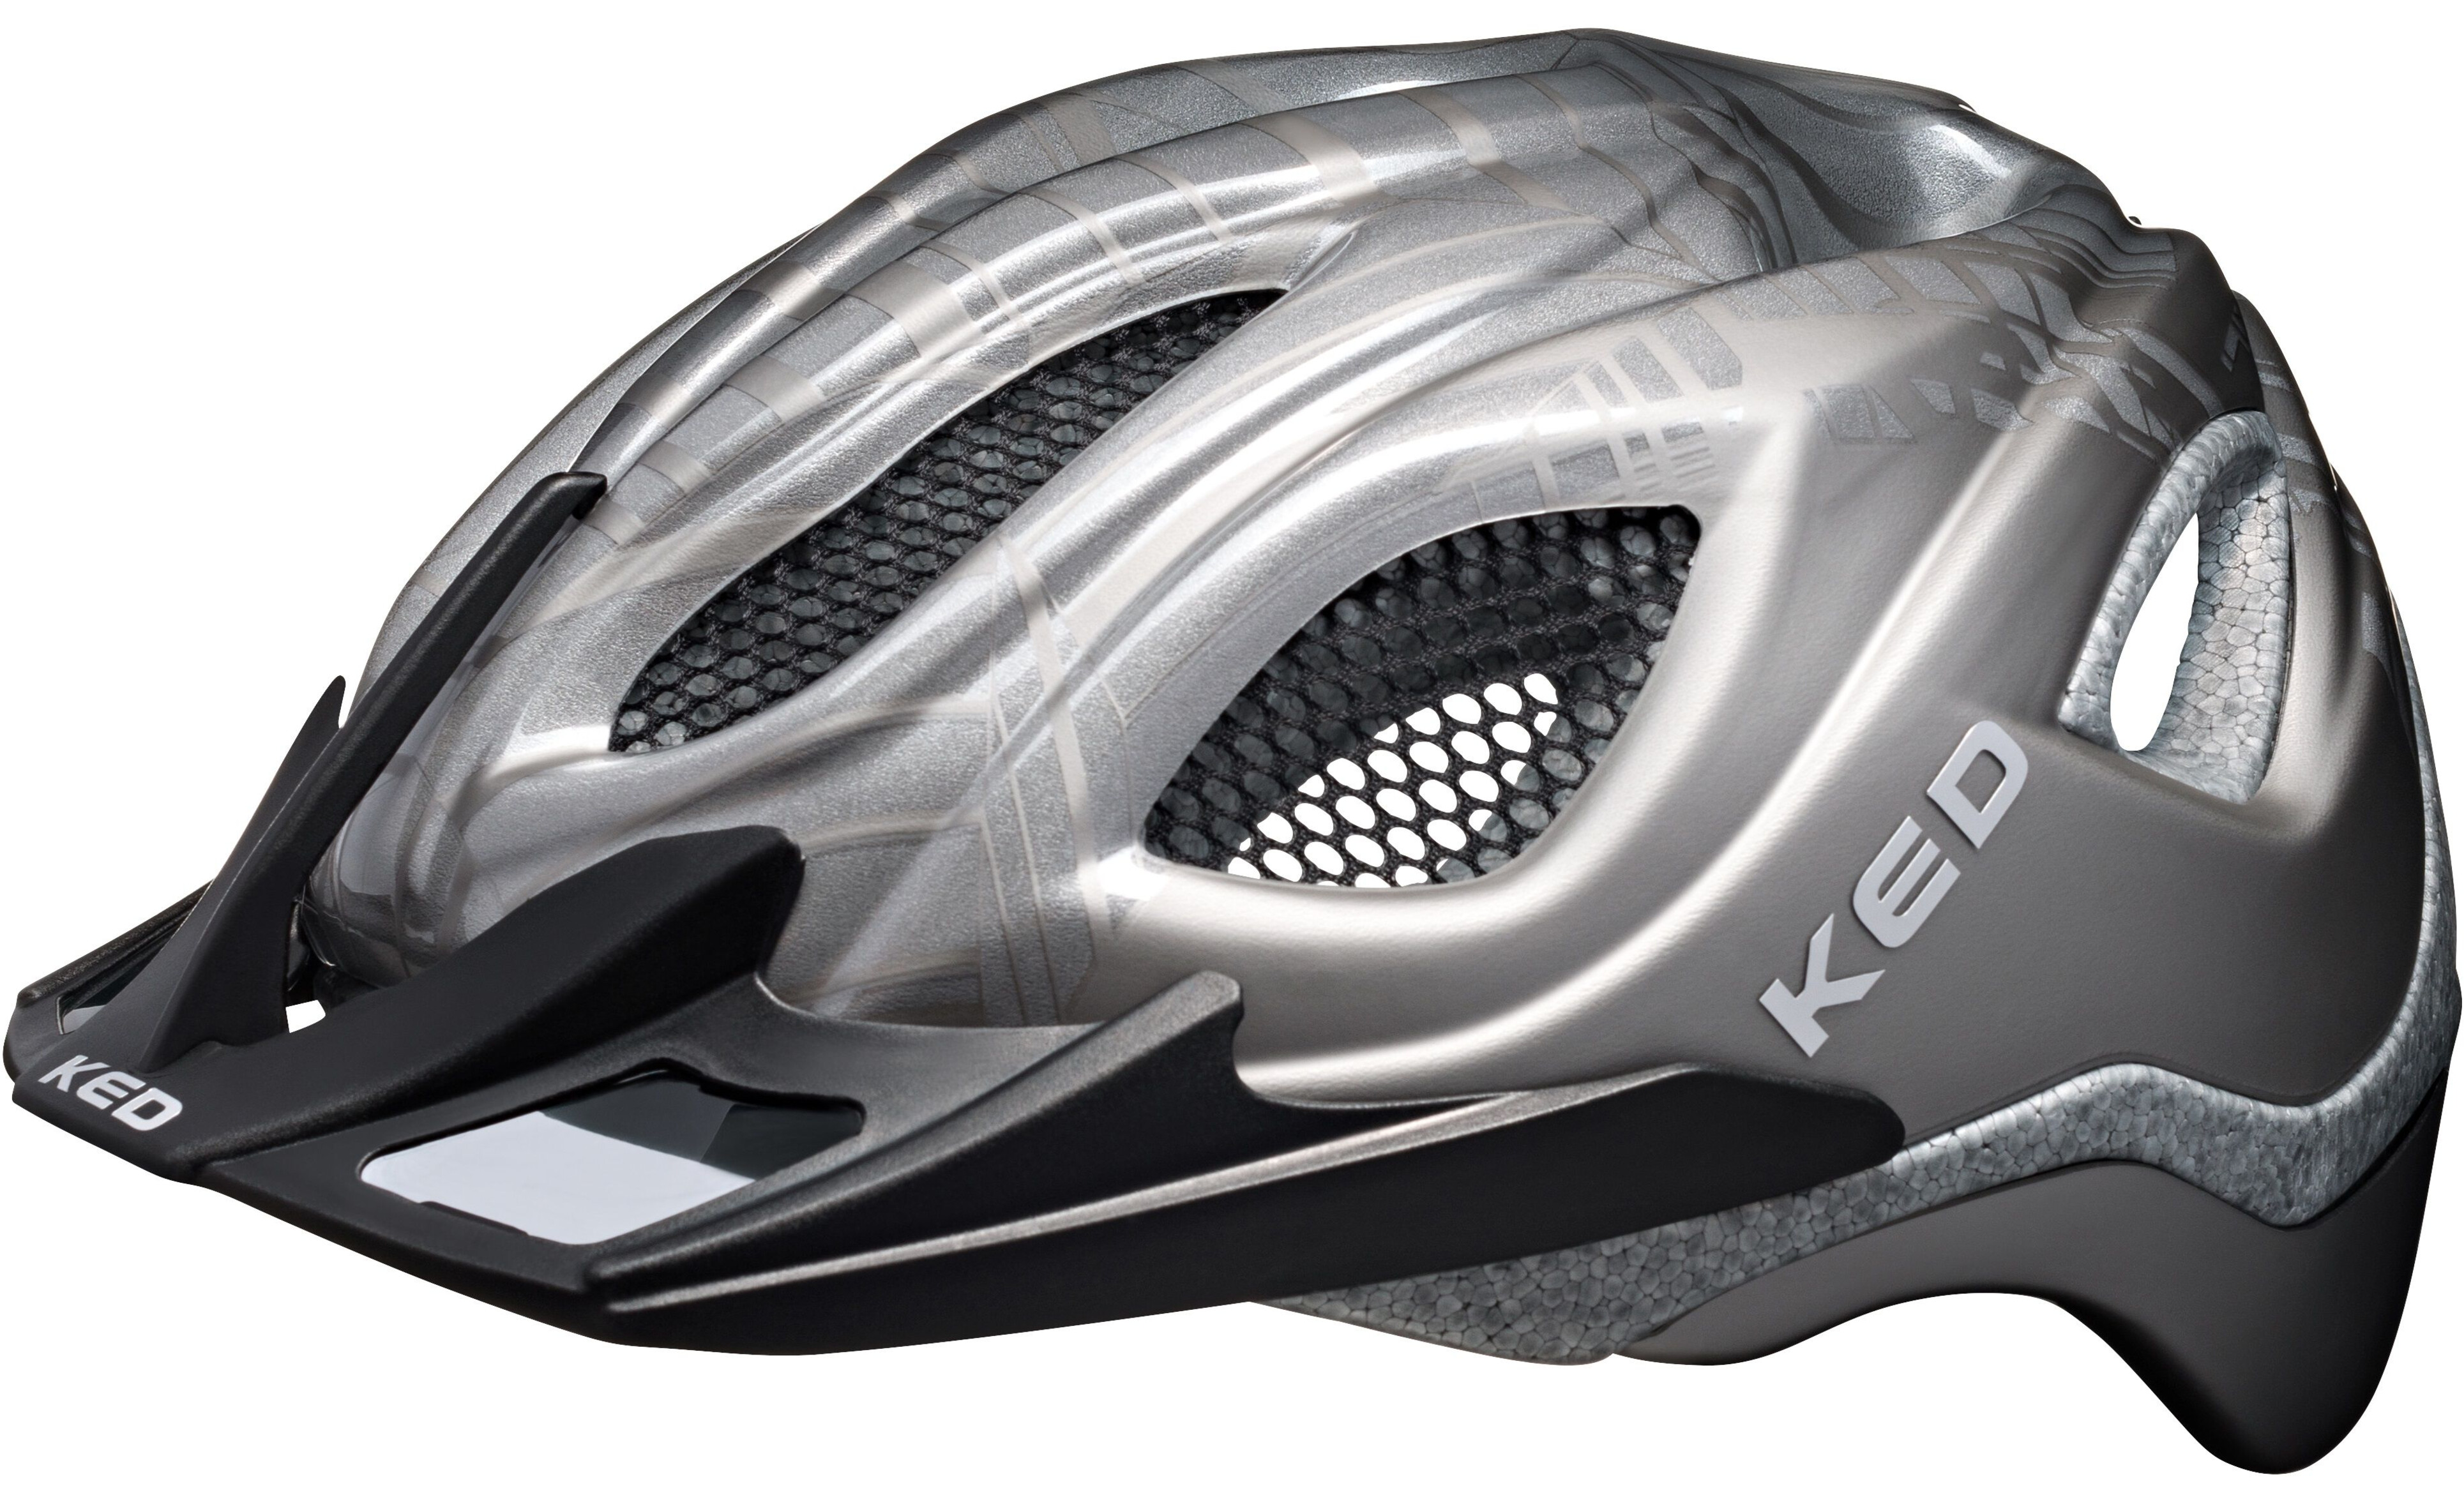 ked certus k star casco per bici grigio argento su. Black Bedroom Furniture Sets. Home Design Ideas